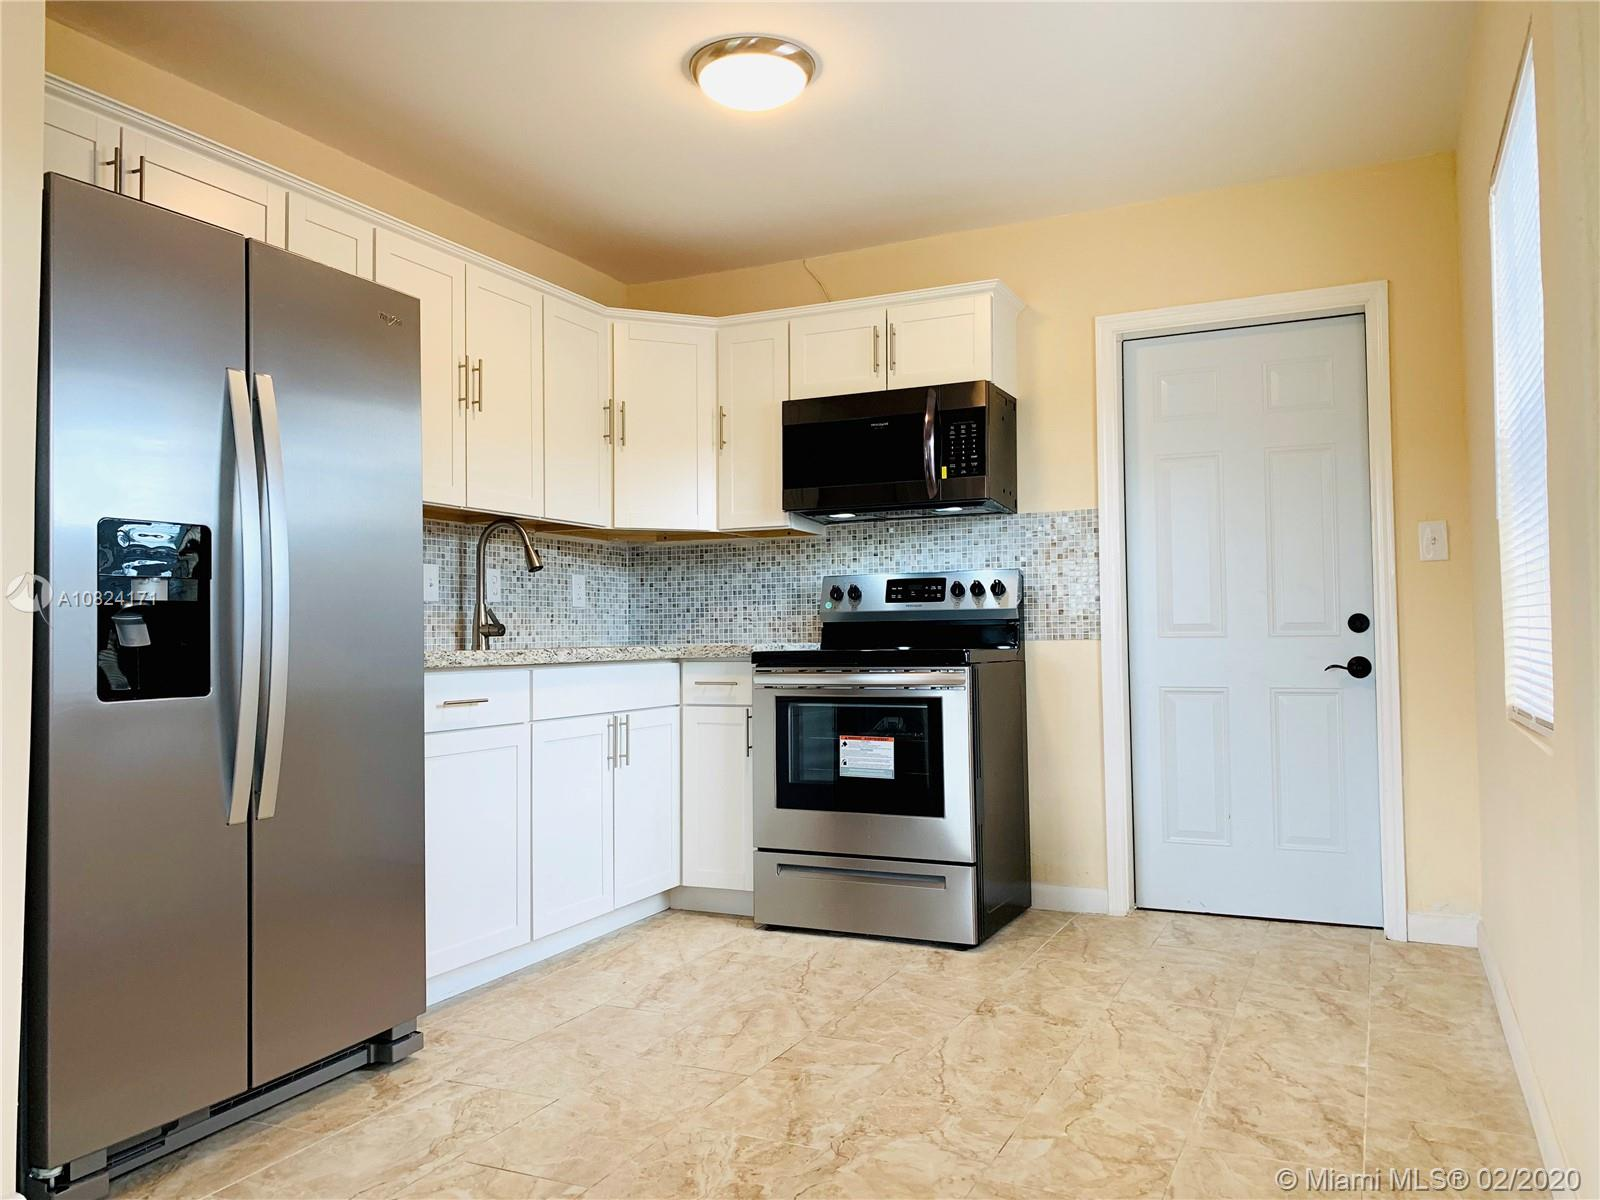 112 SW 67th Ave, Pembroke Pines, FL 33023 - Pembroke Pines, FL real estate listing